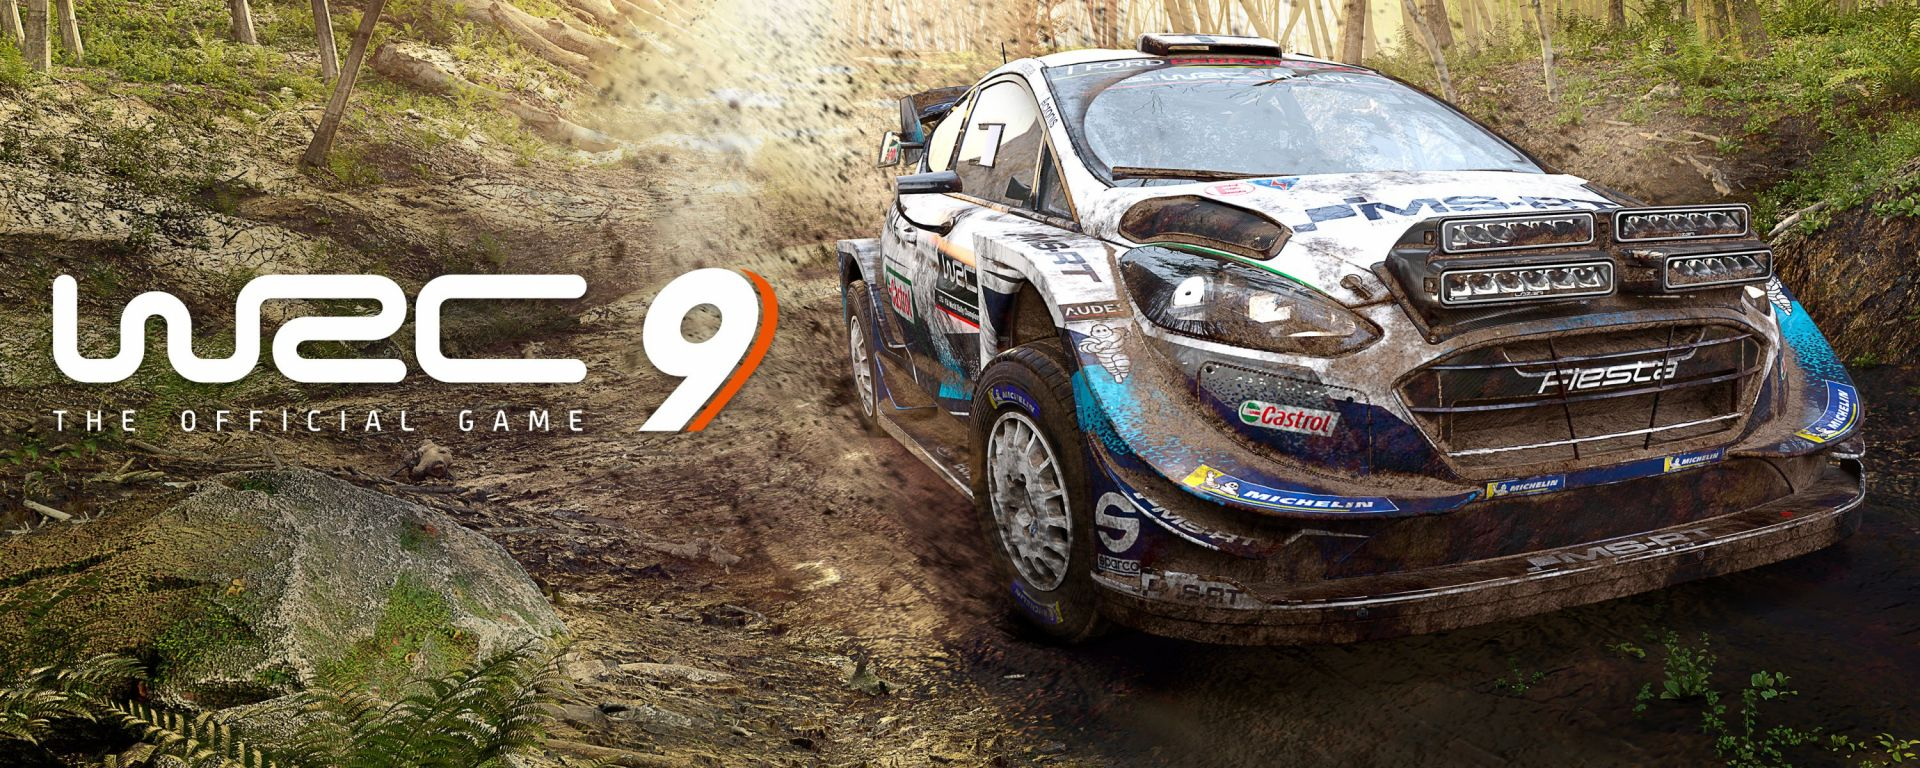 WRC 9: in arrivo su PlayStation 5